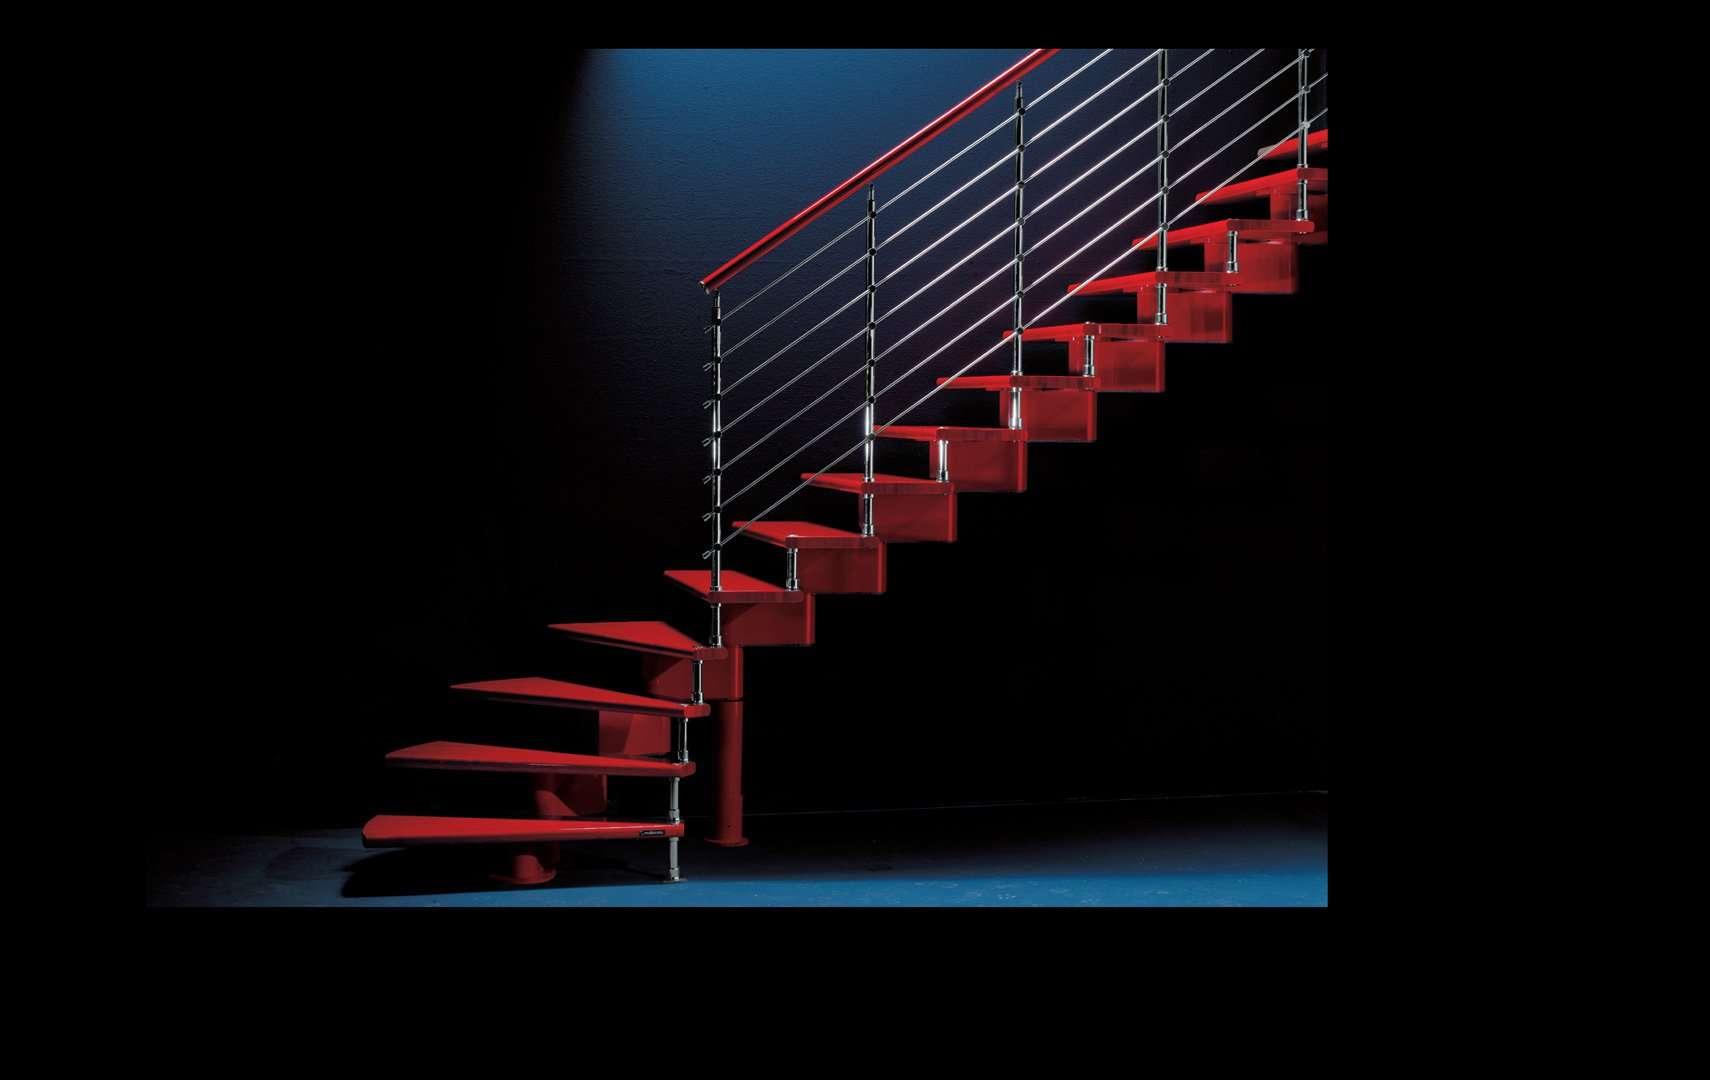 escalier escalier colima on rampe escalier monte escalier escalier quart tournant. Black Bedroom Furniture Sets. Home Design Ideas